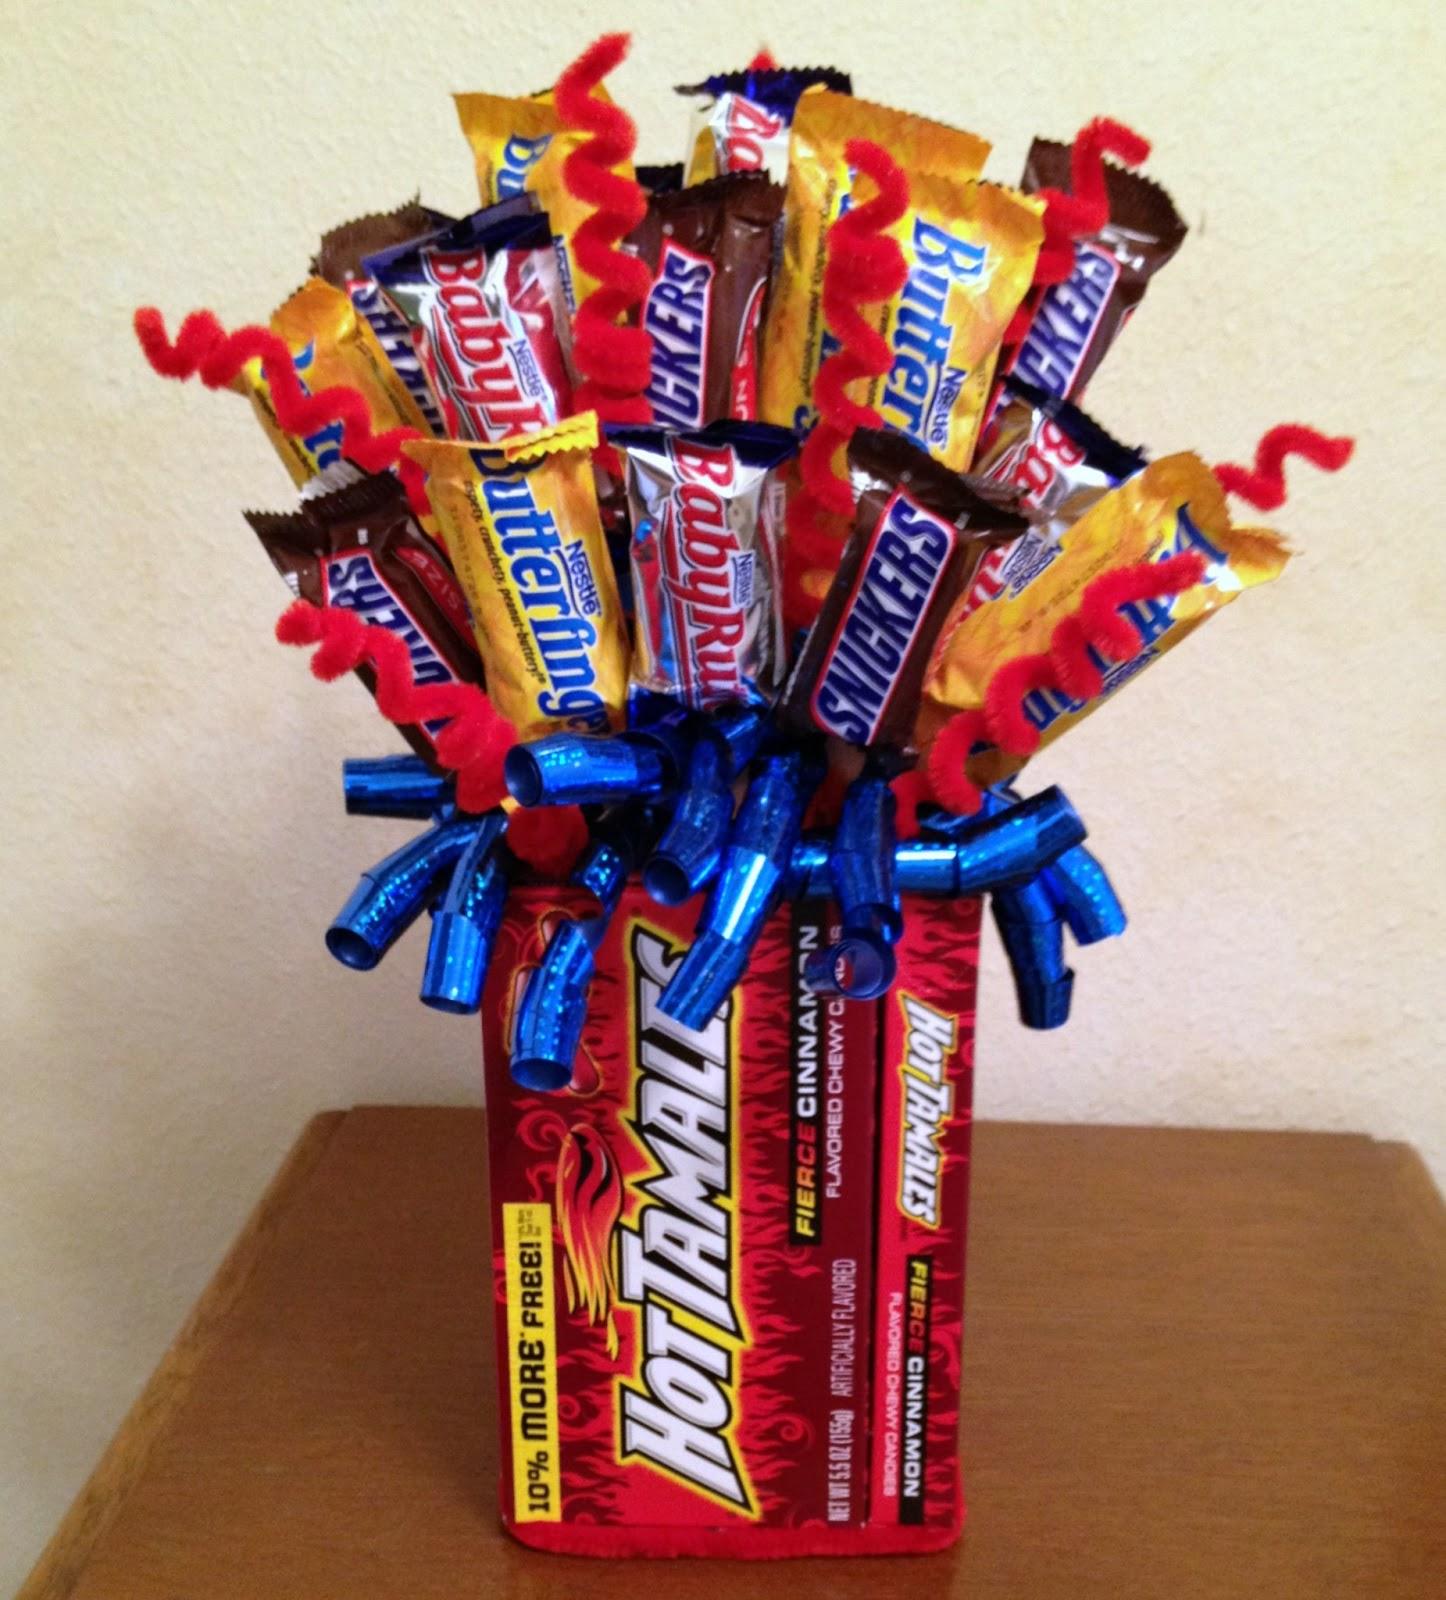 Candy bar tree ideas pixshark images galleries